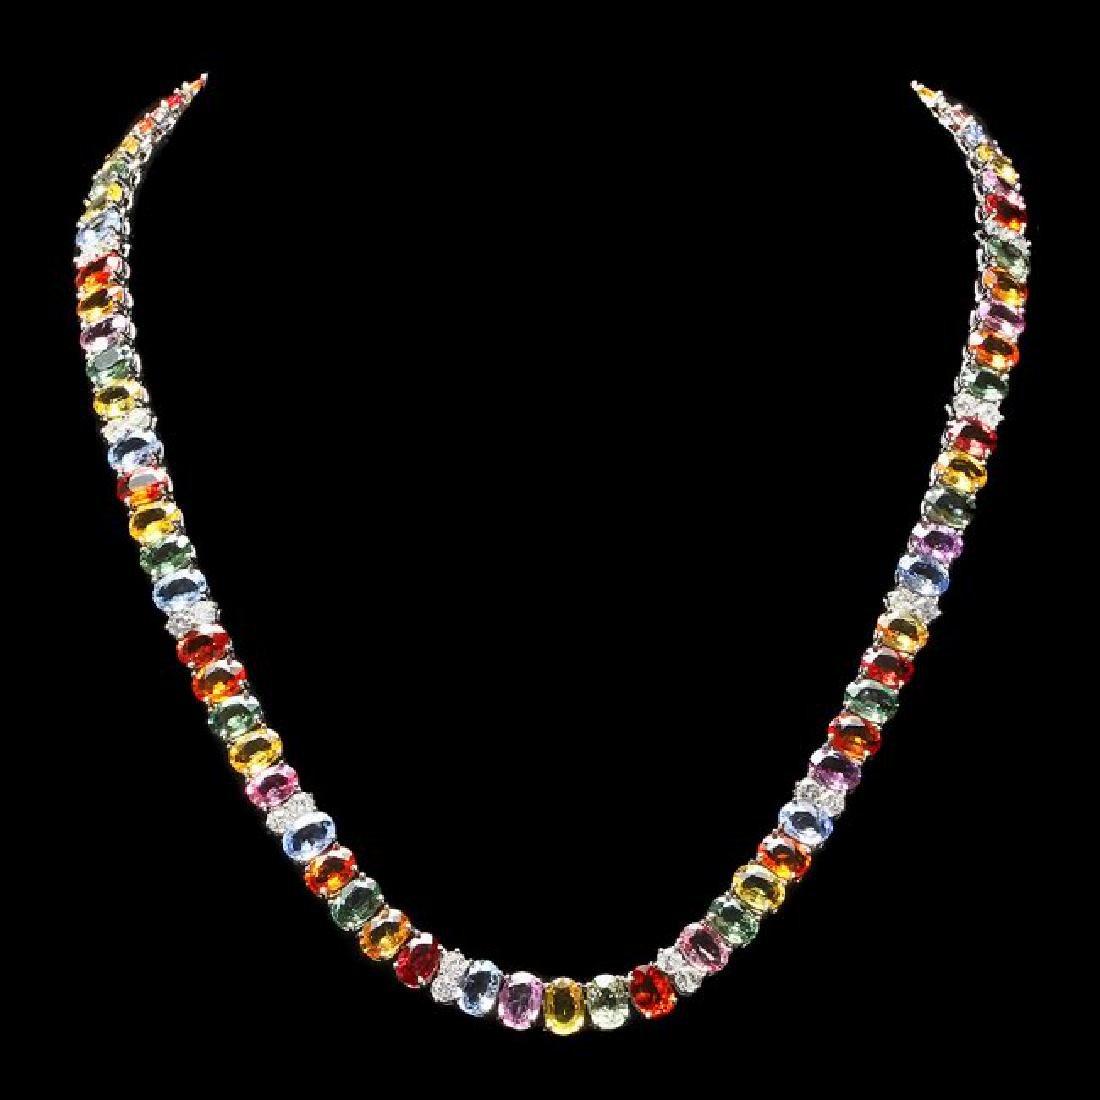 14k Gold 67.00ct Sapphire 4.00ct Diamond Necklace